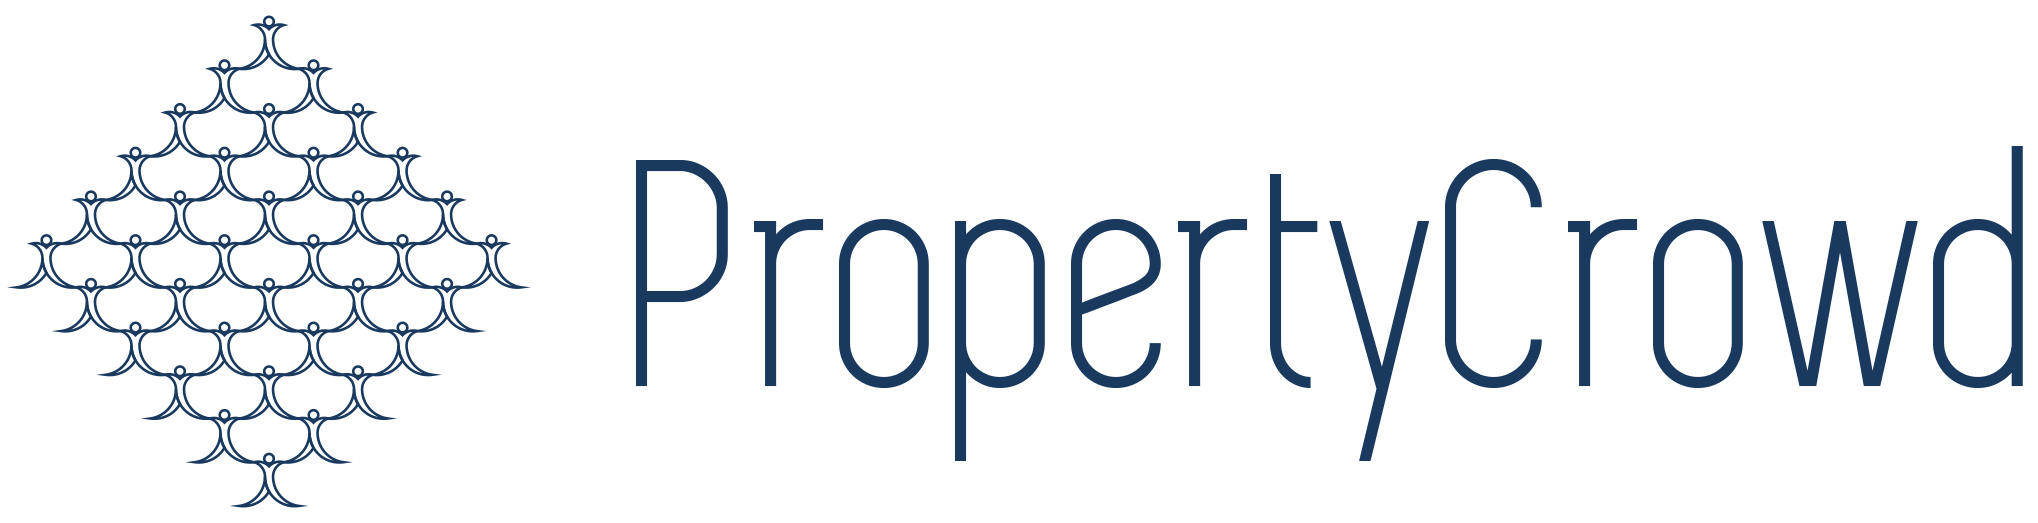 Property Crowd Logo